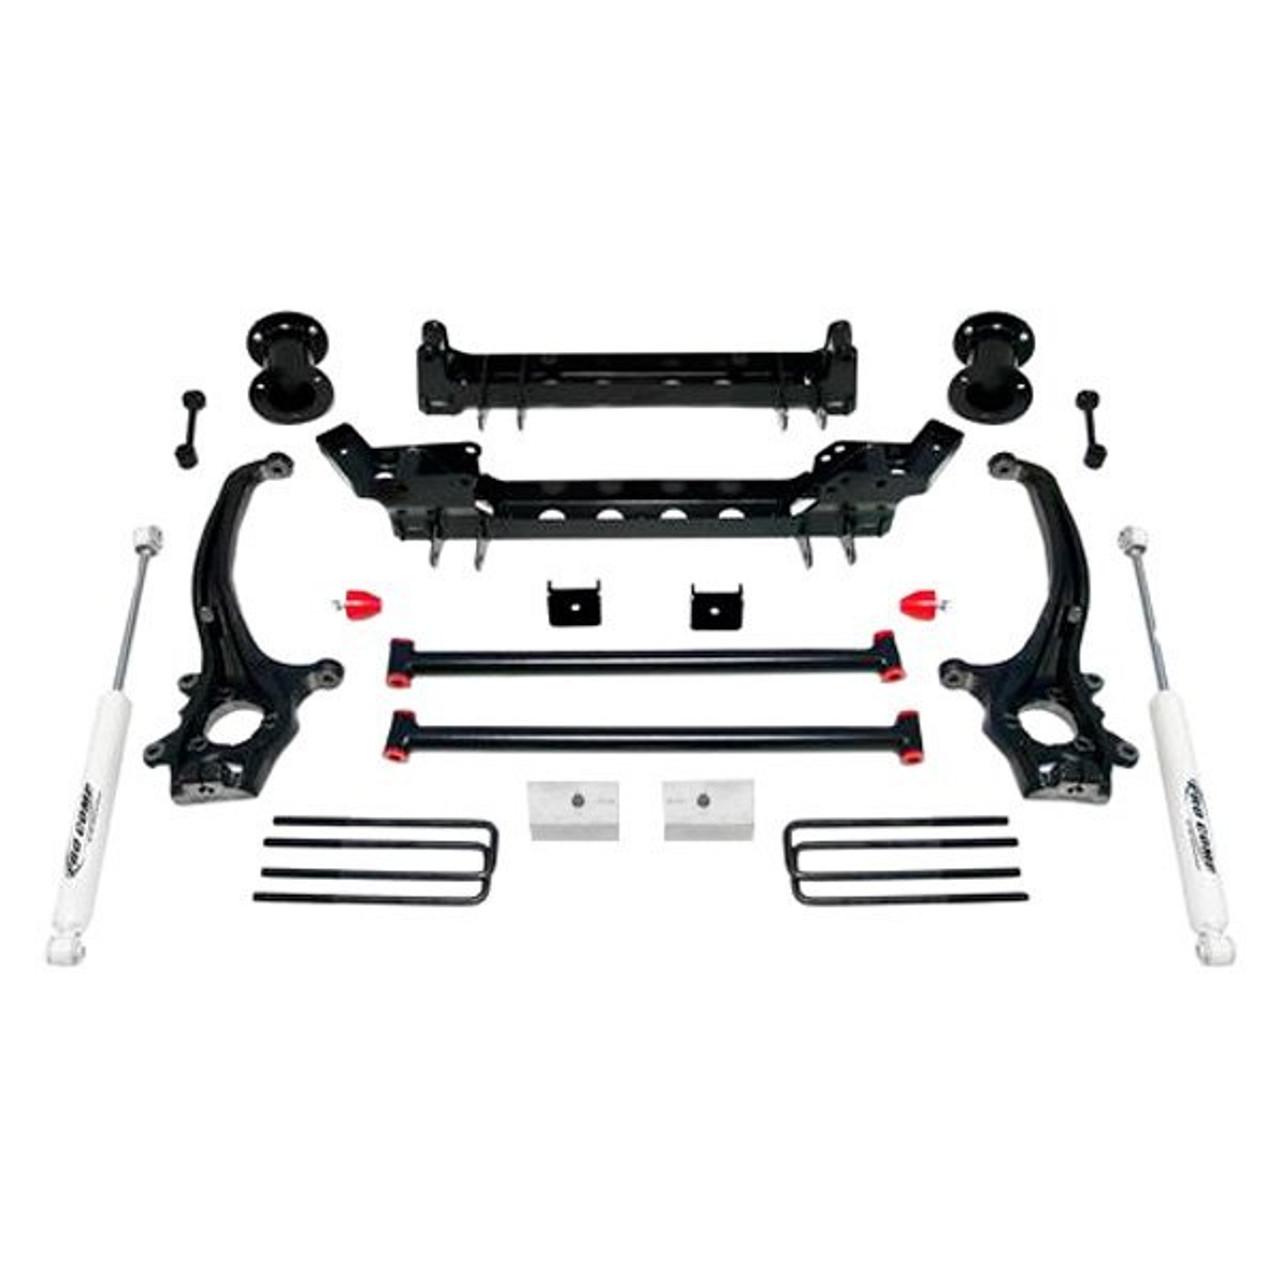 Steel Rear 2 5 Lift Kit For Titan 2wd Car